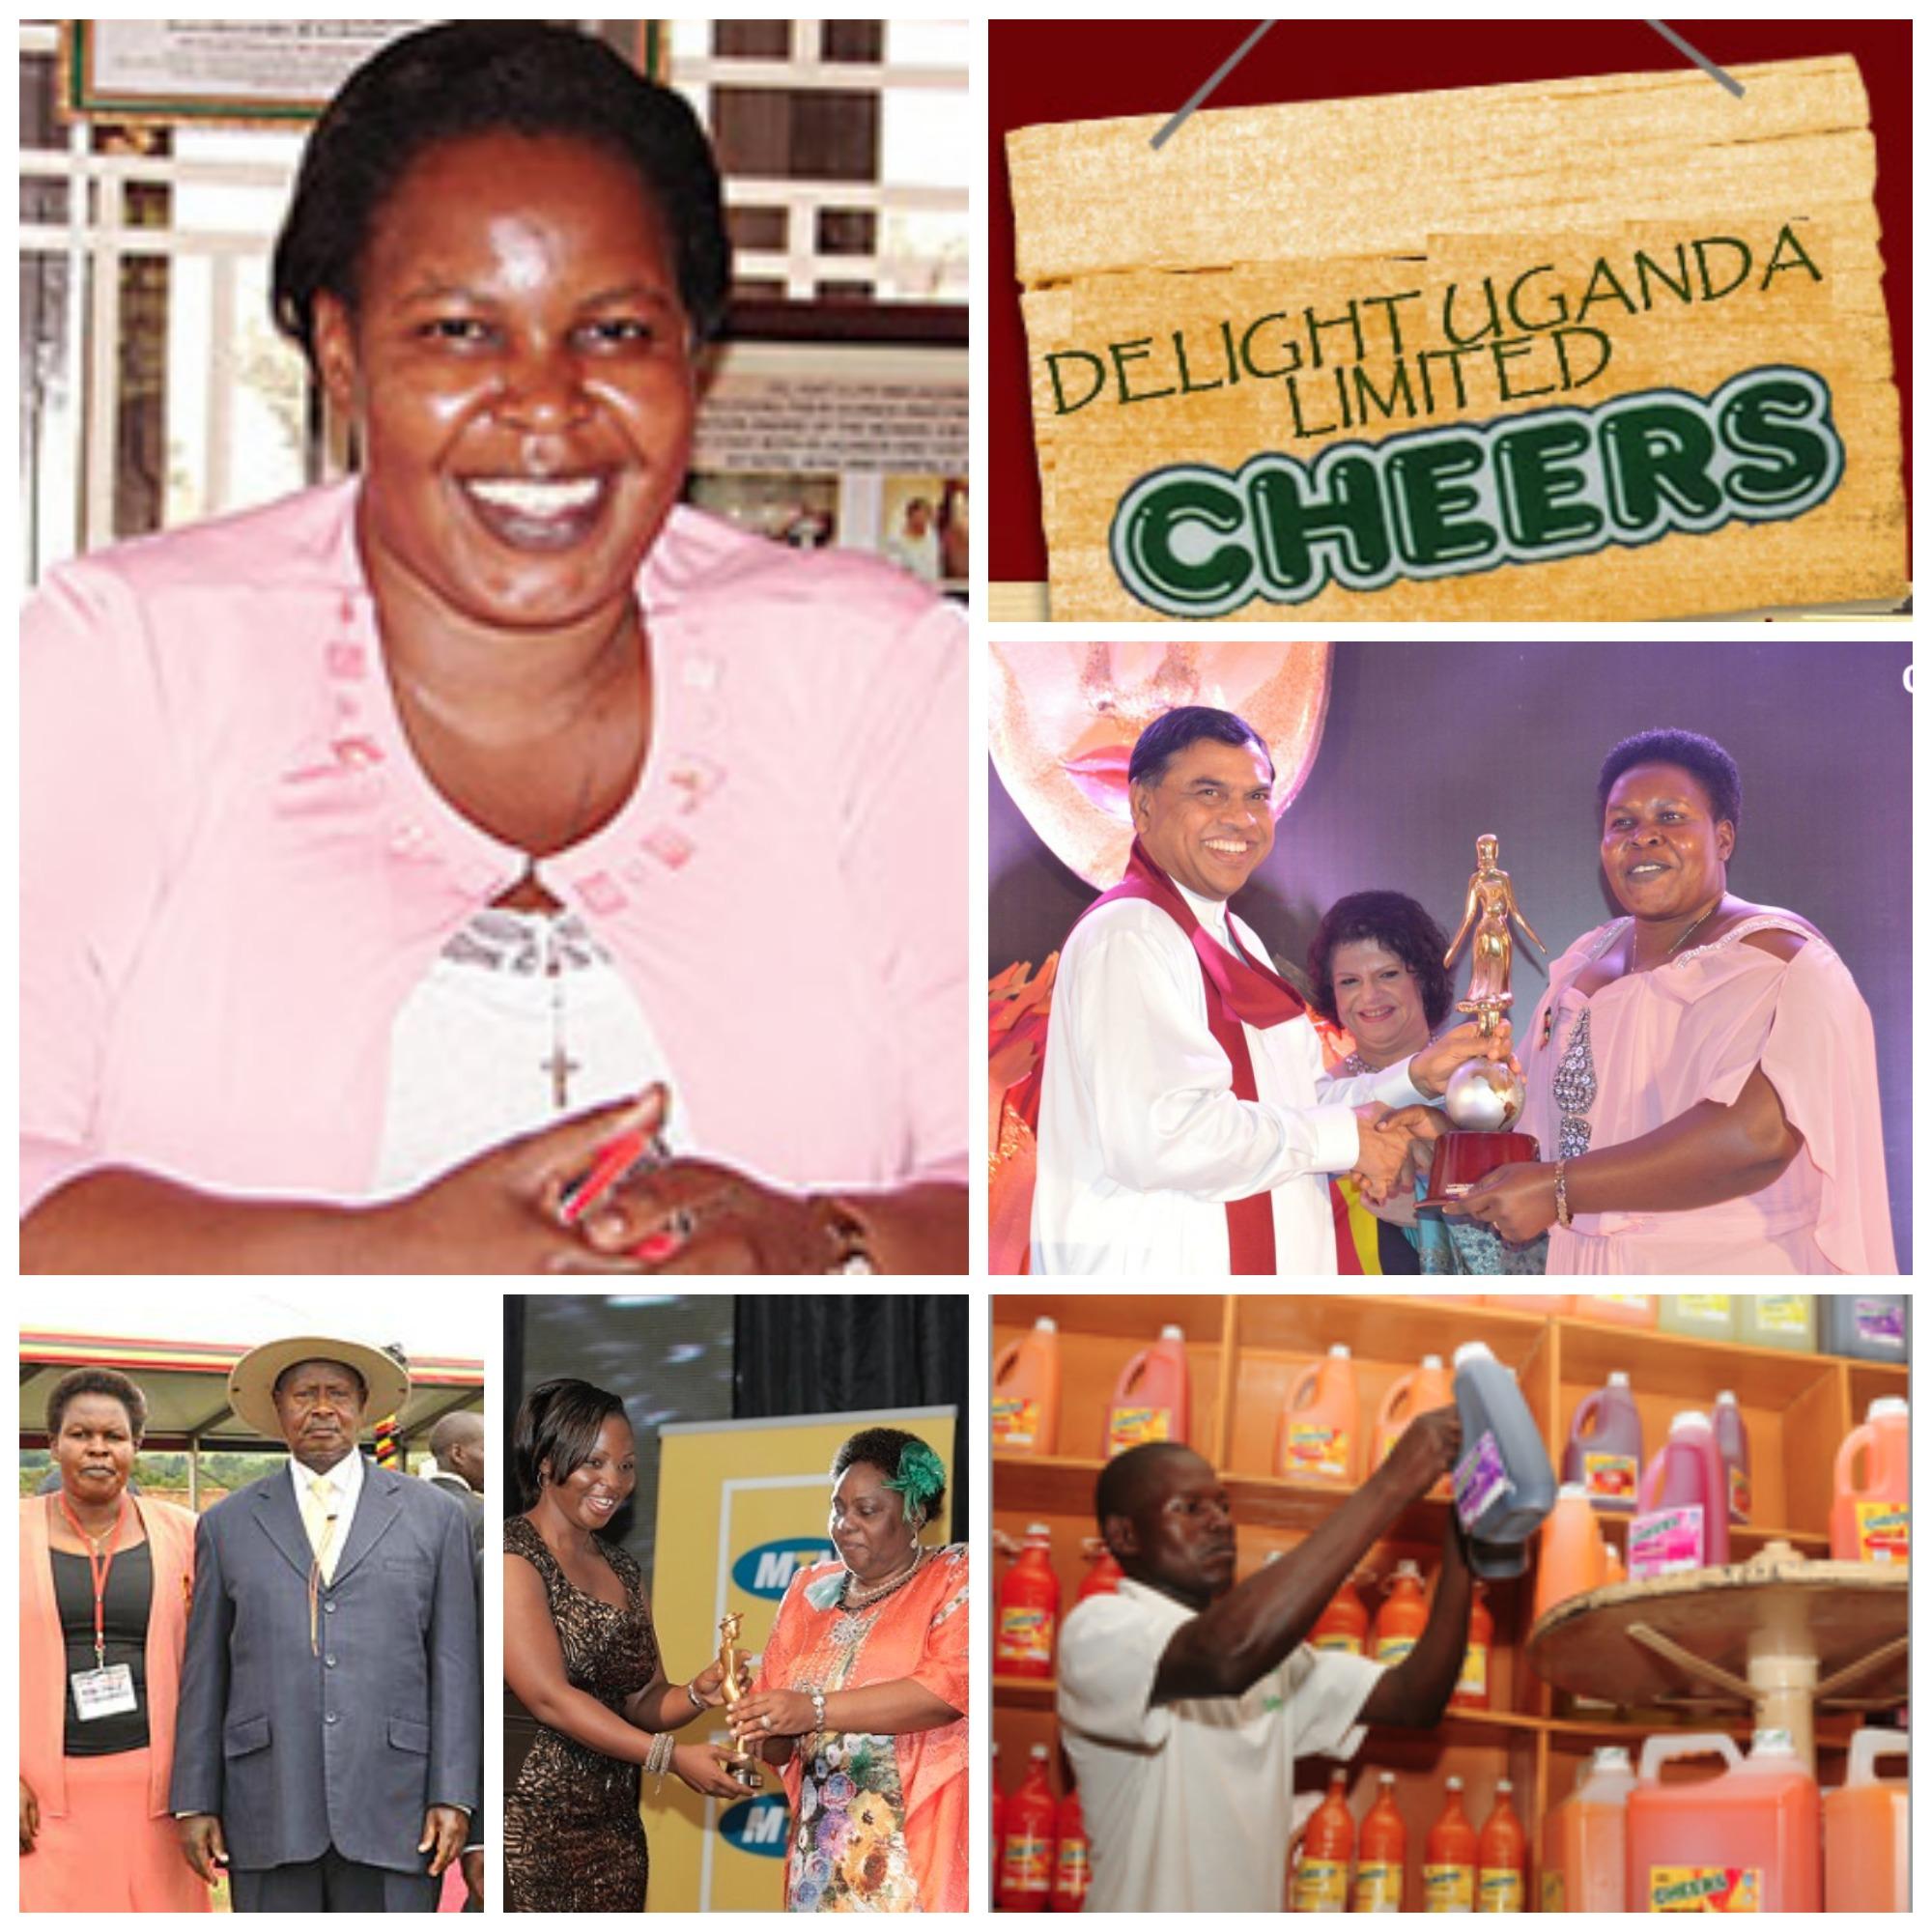 Julian 'Mama Cheers' Omalla , founder of Delight Limited, Uganda